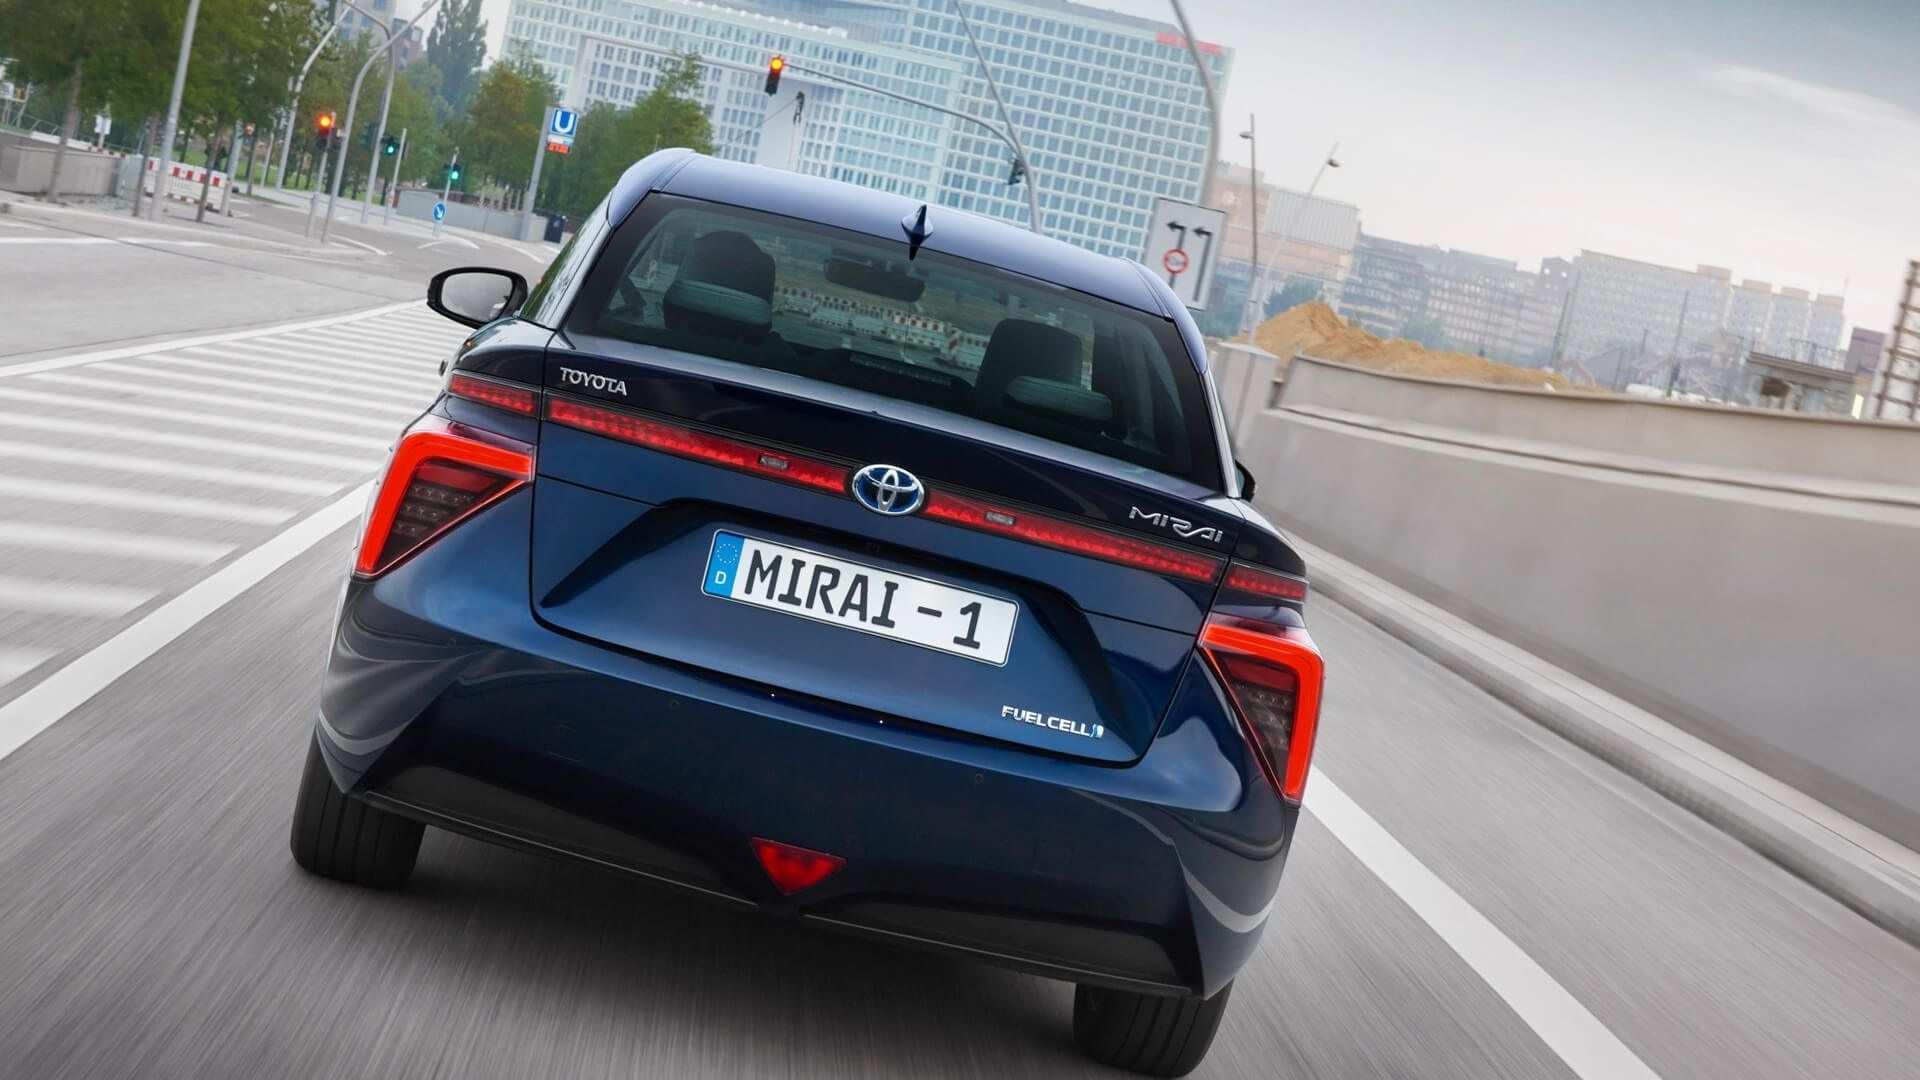 16 New Toyota Mirai 2020 Performance with Toyota Mirai 2020